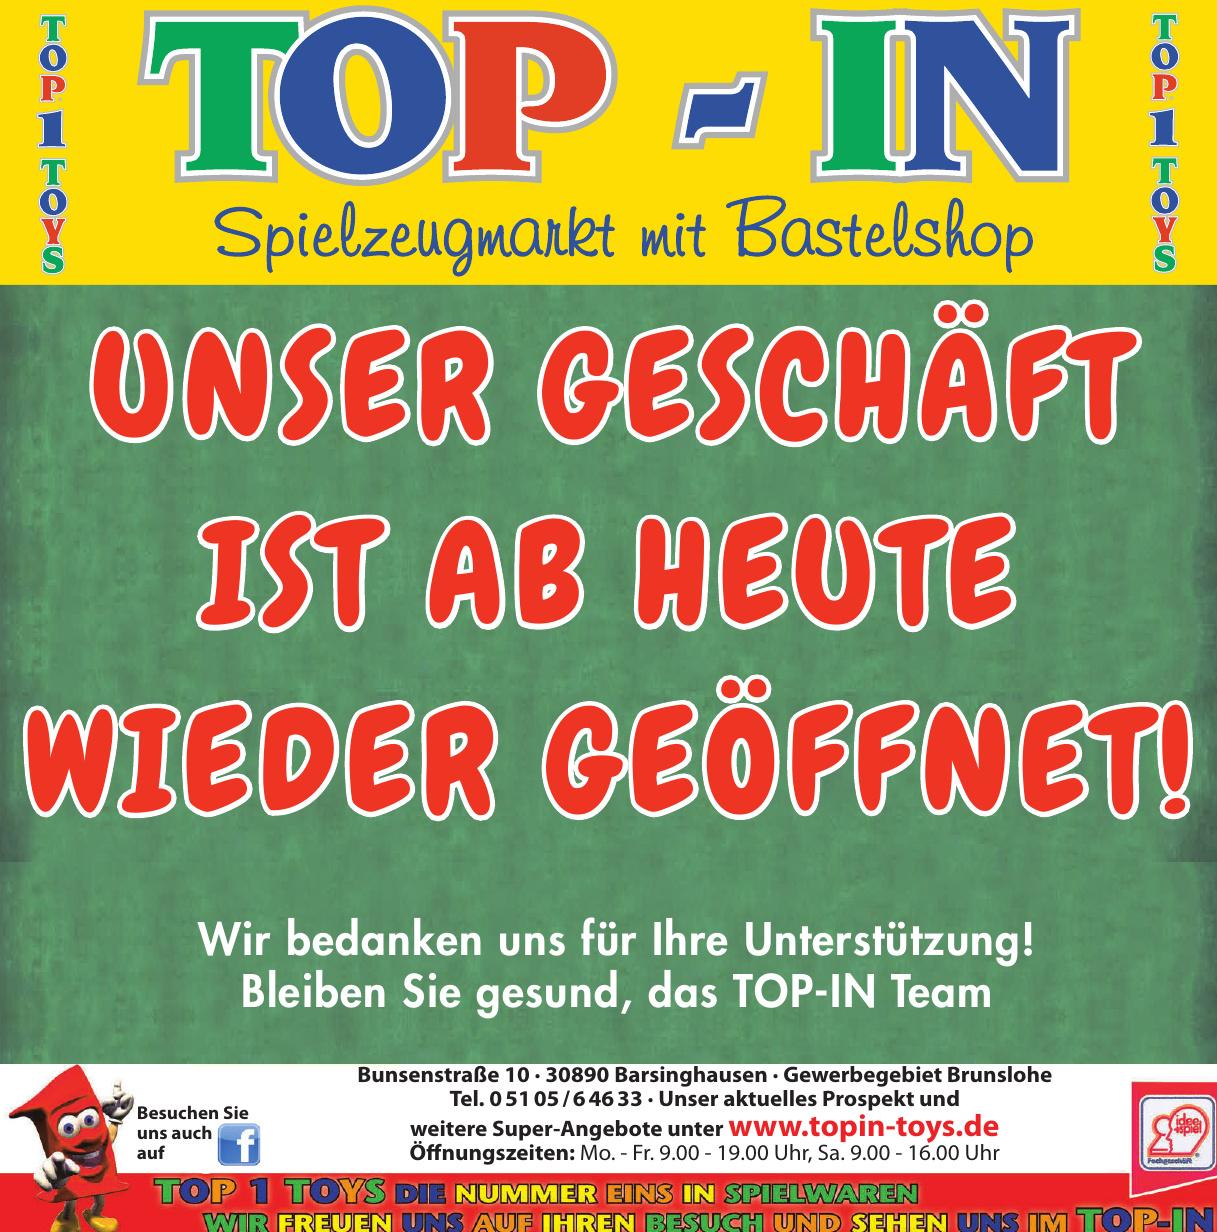 TOP-IN Spielzeugmarkt